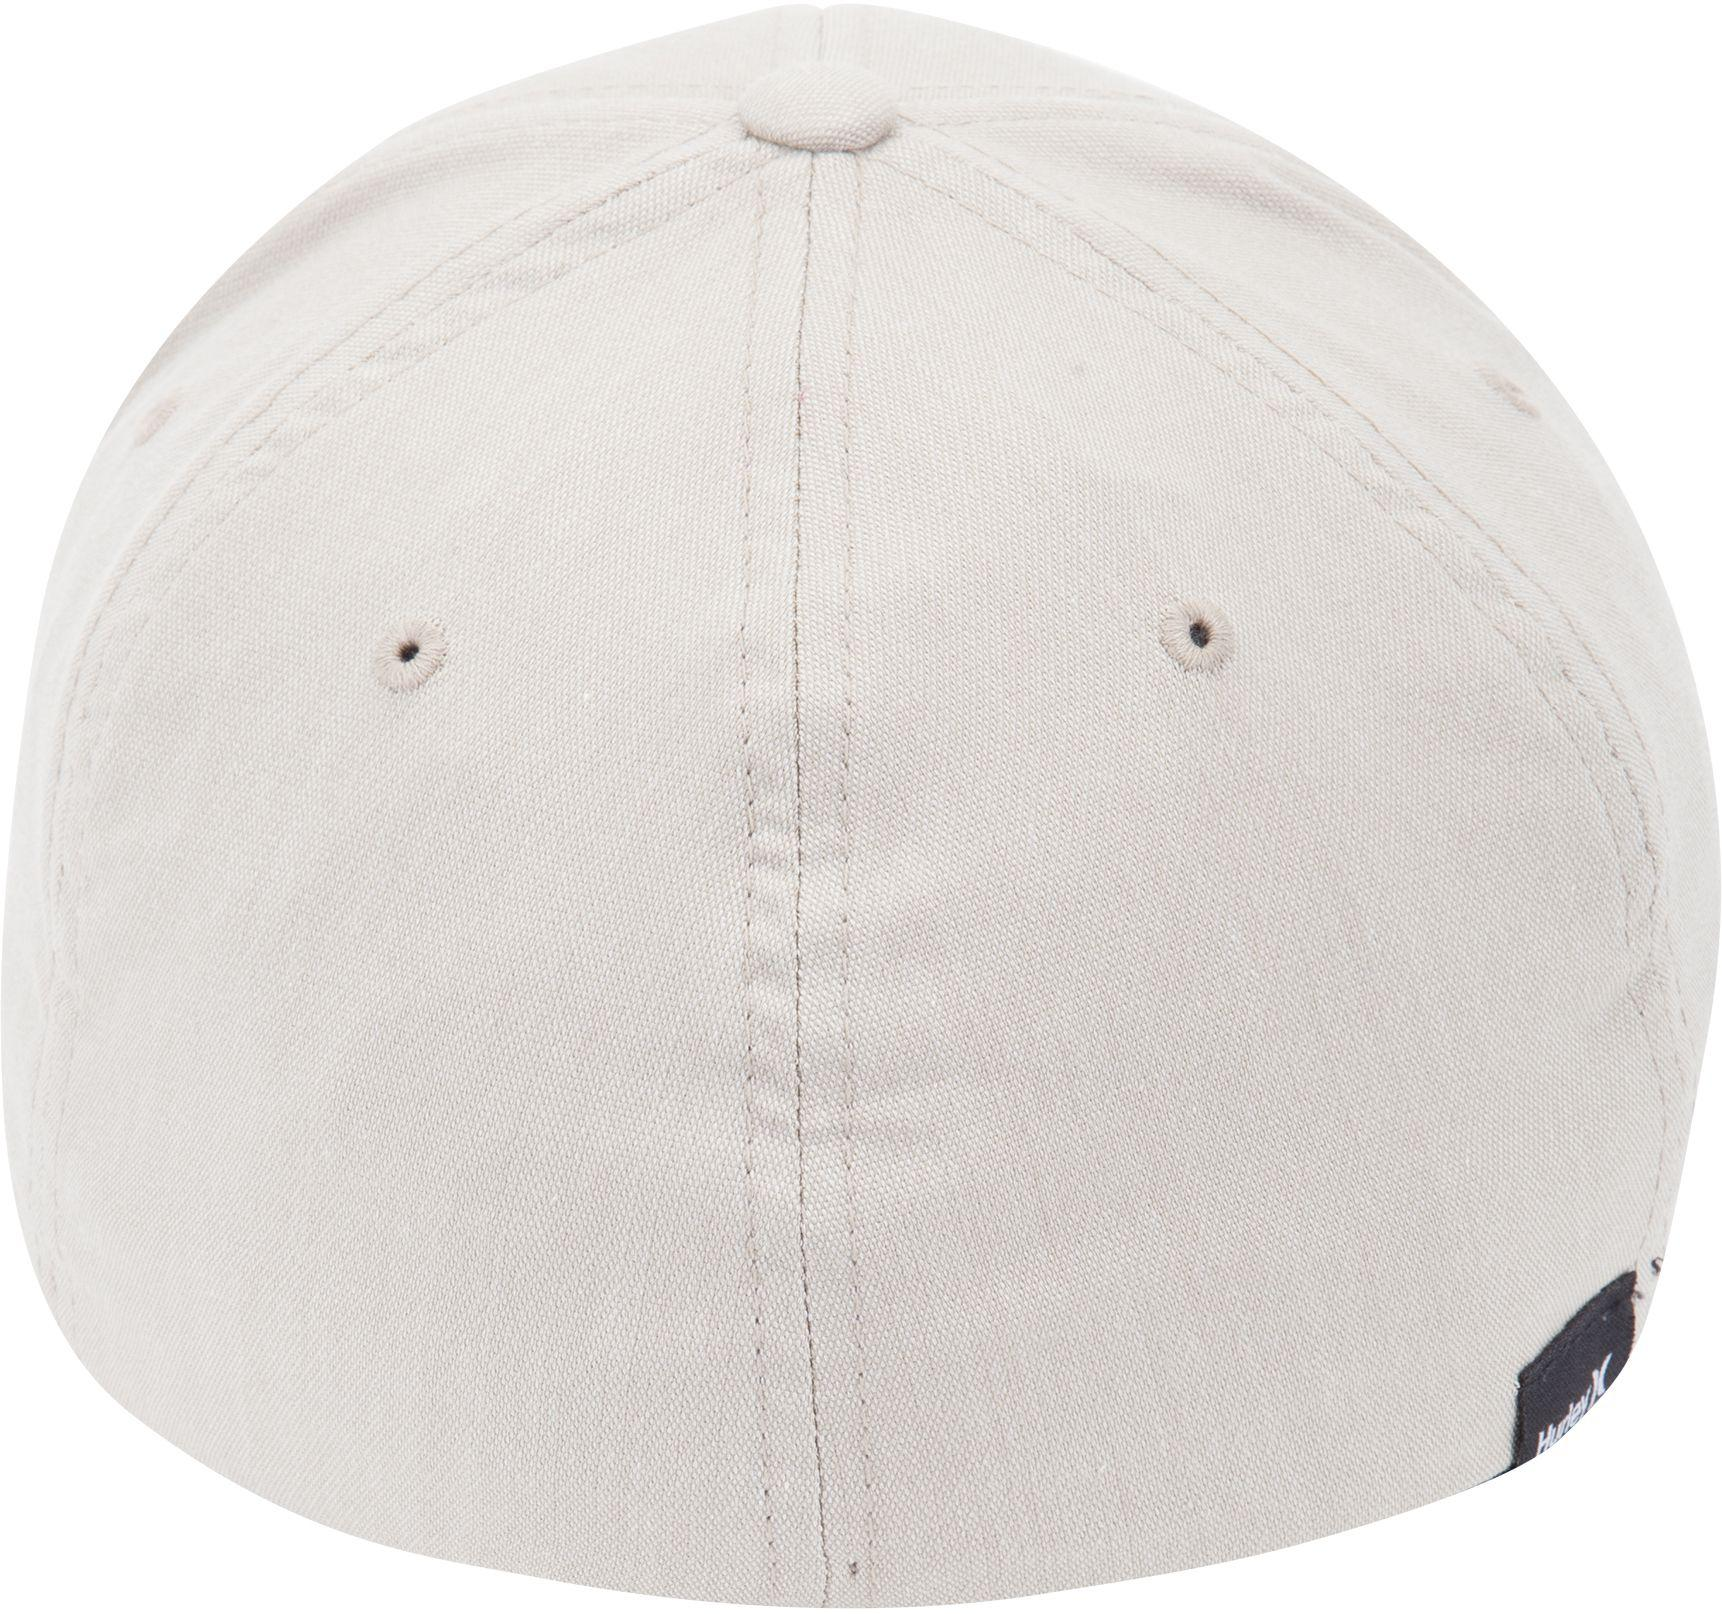 the latest 508f4 3ef8d 9b27e d3921  amazon lyst hurley dri fit flow flexfit hat in natural for men  79316 91c63